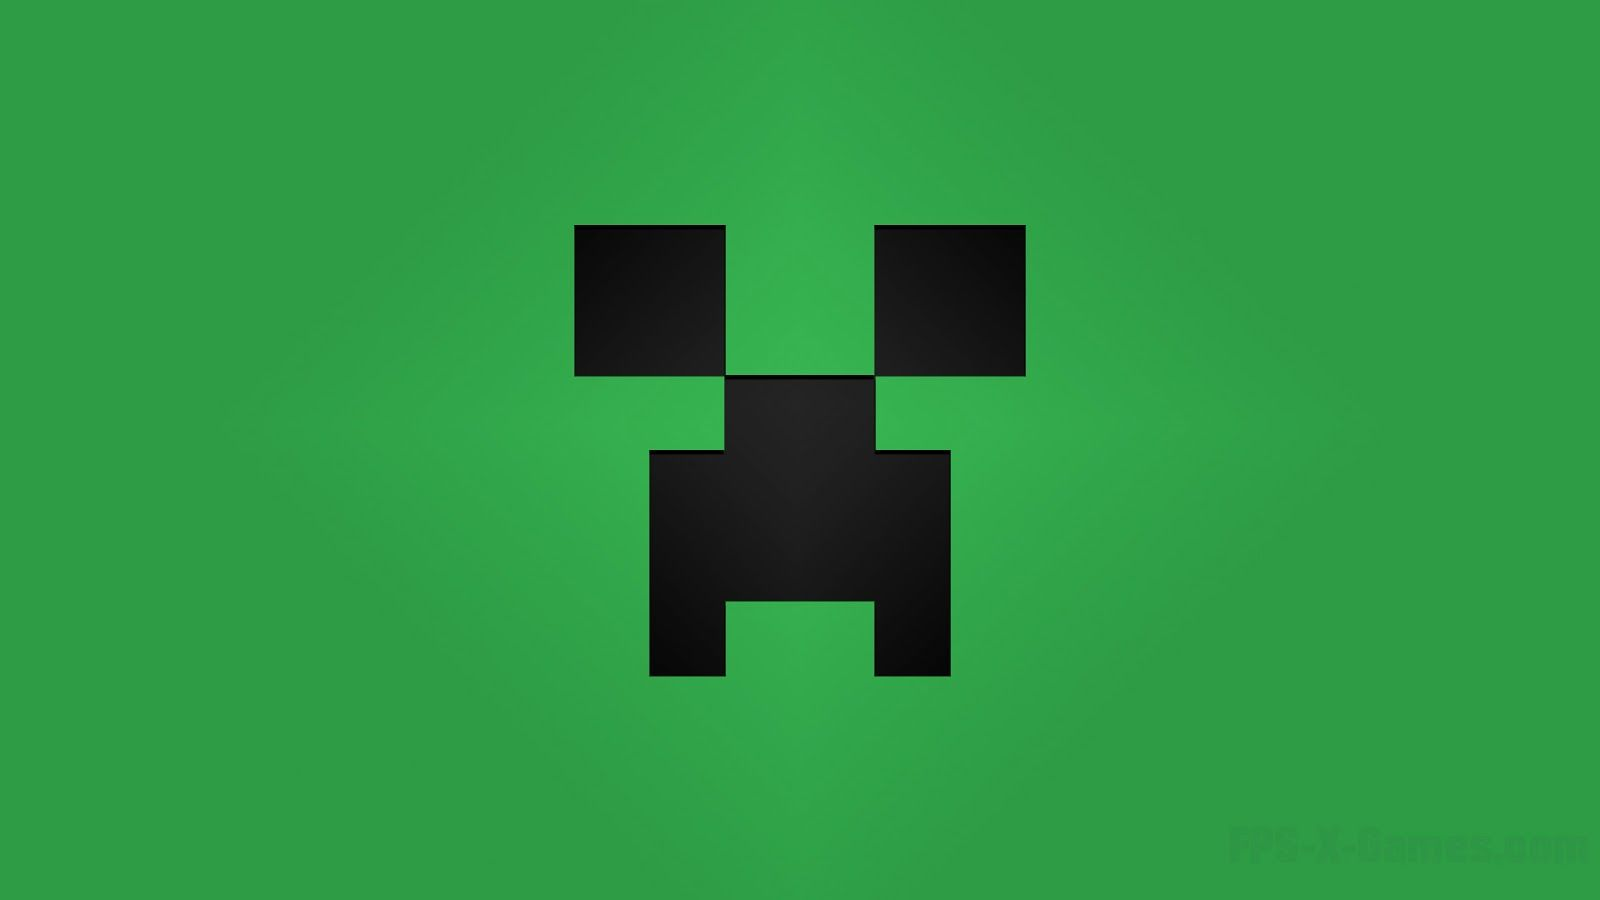 Minecraft Creeper Desktop Wallpapers Green Minecraft Wallpaper Creepers